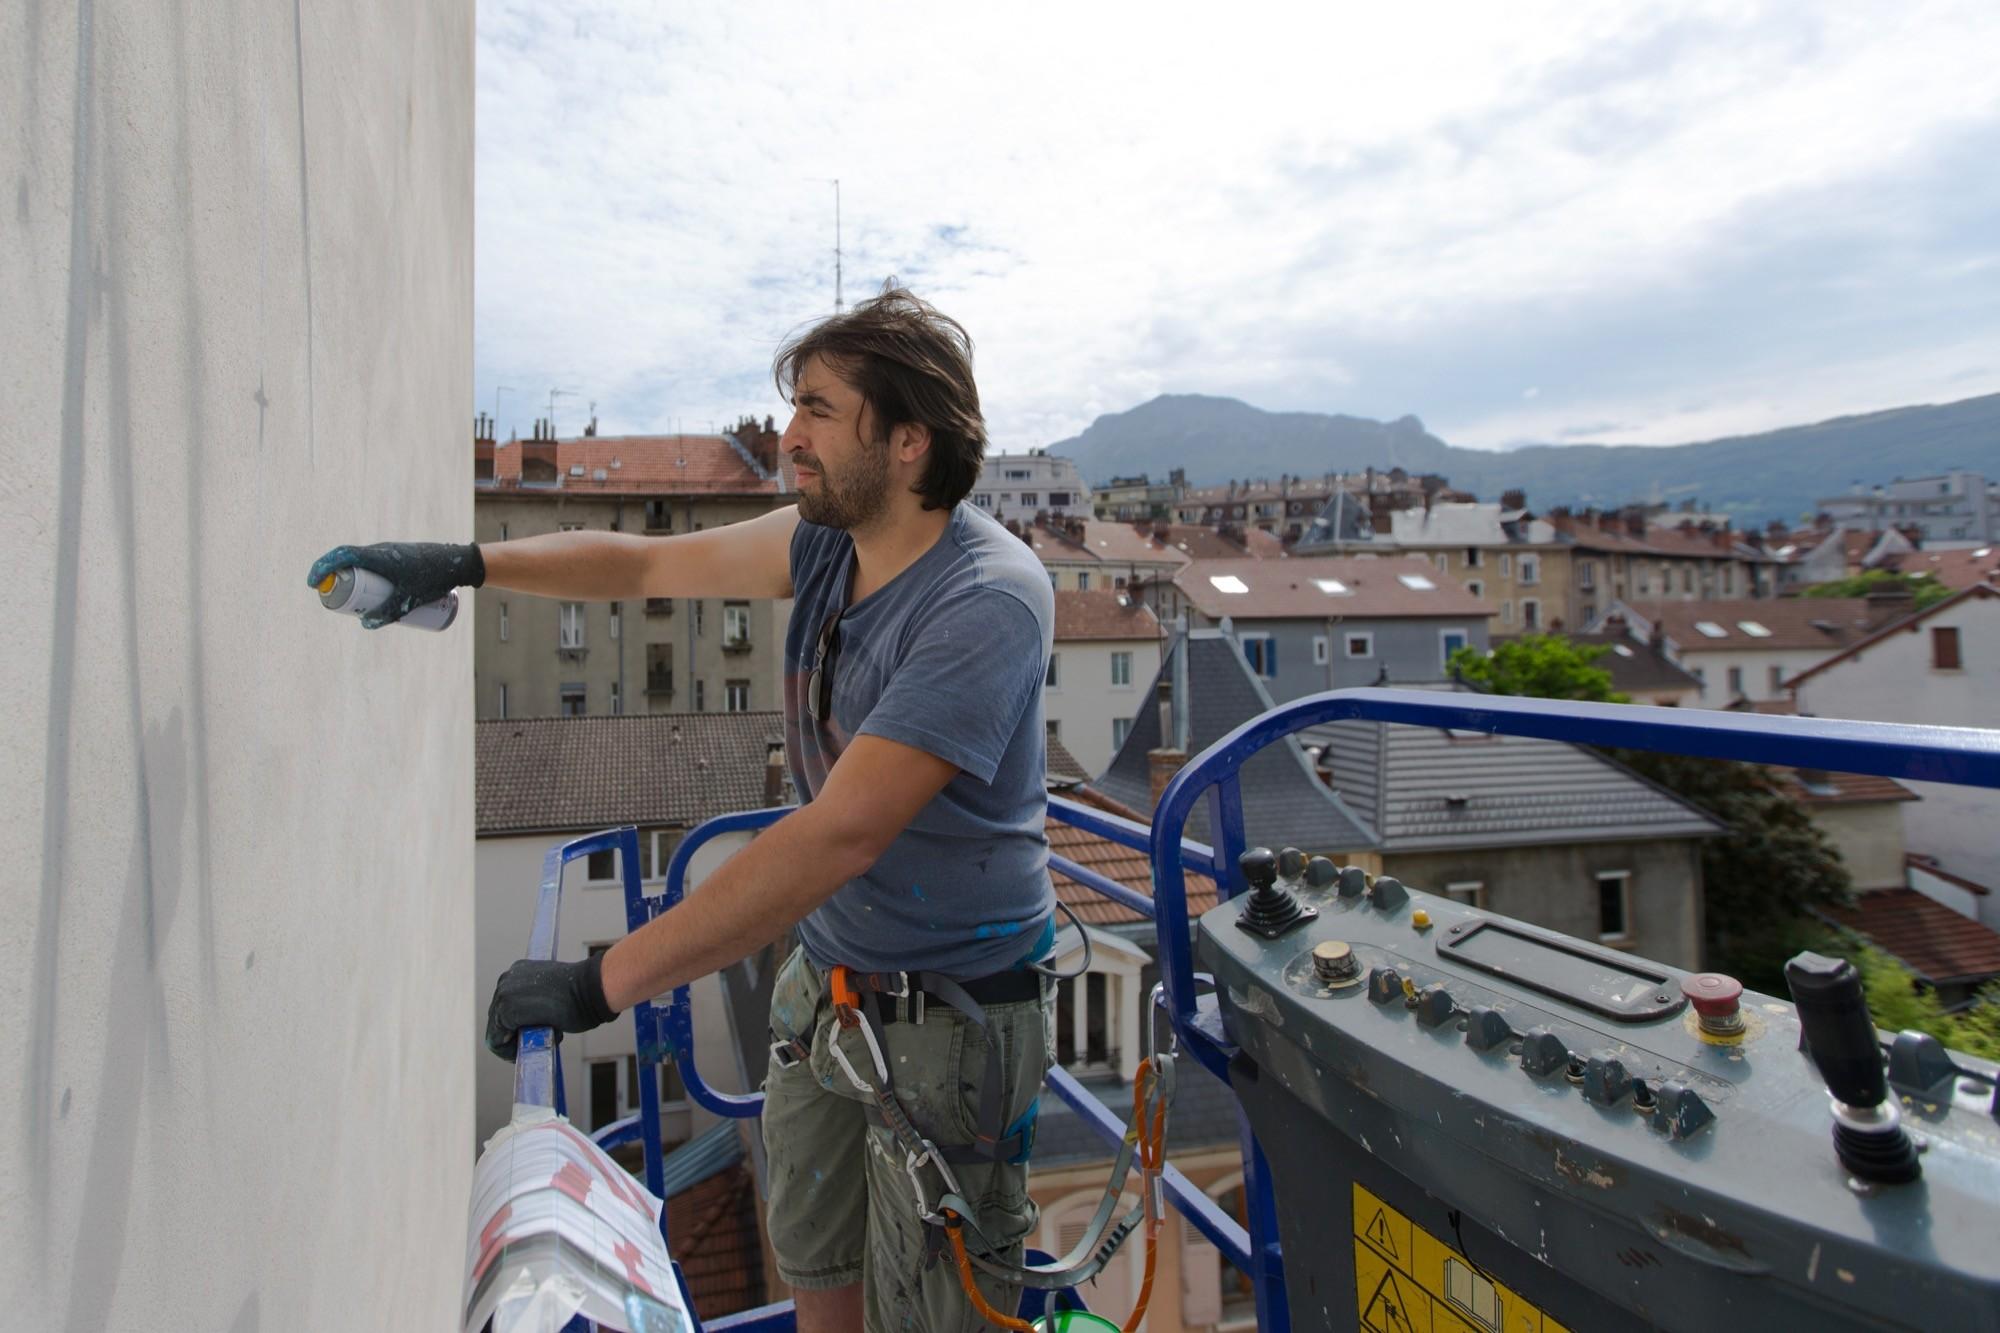 NEVERCREW - Ordering machine - Grenoble 2016 - 11 - at work